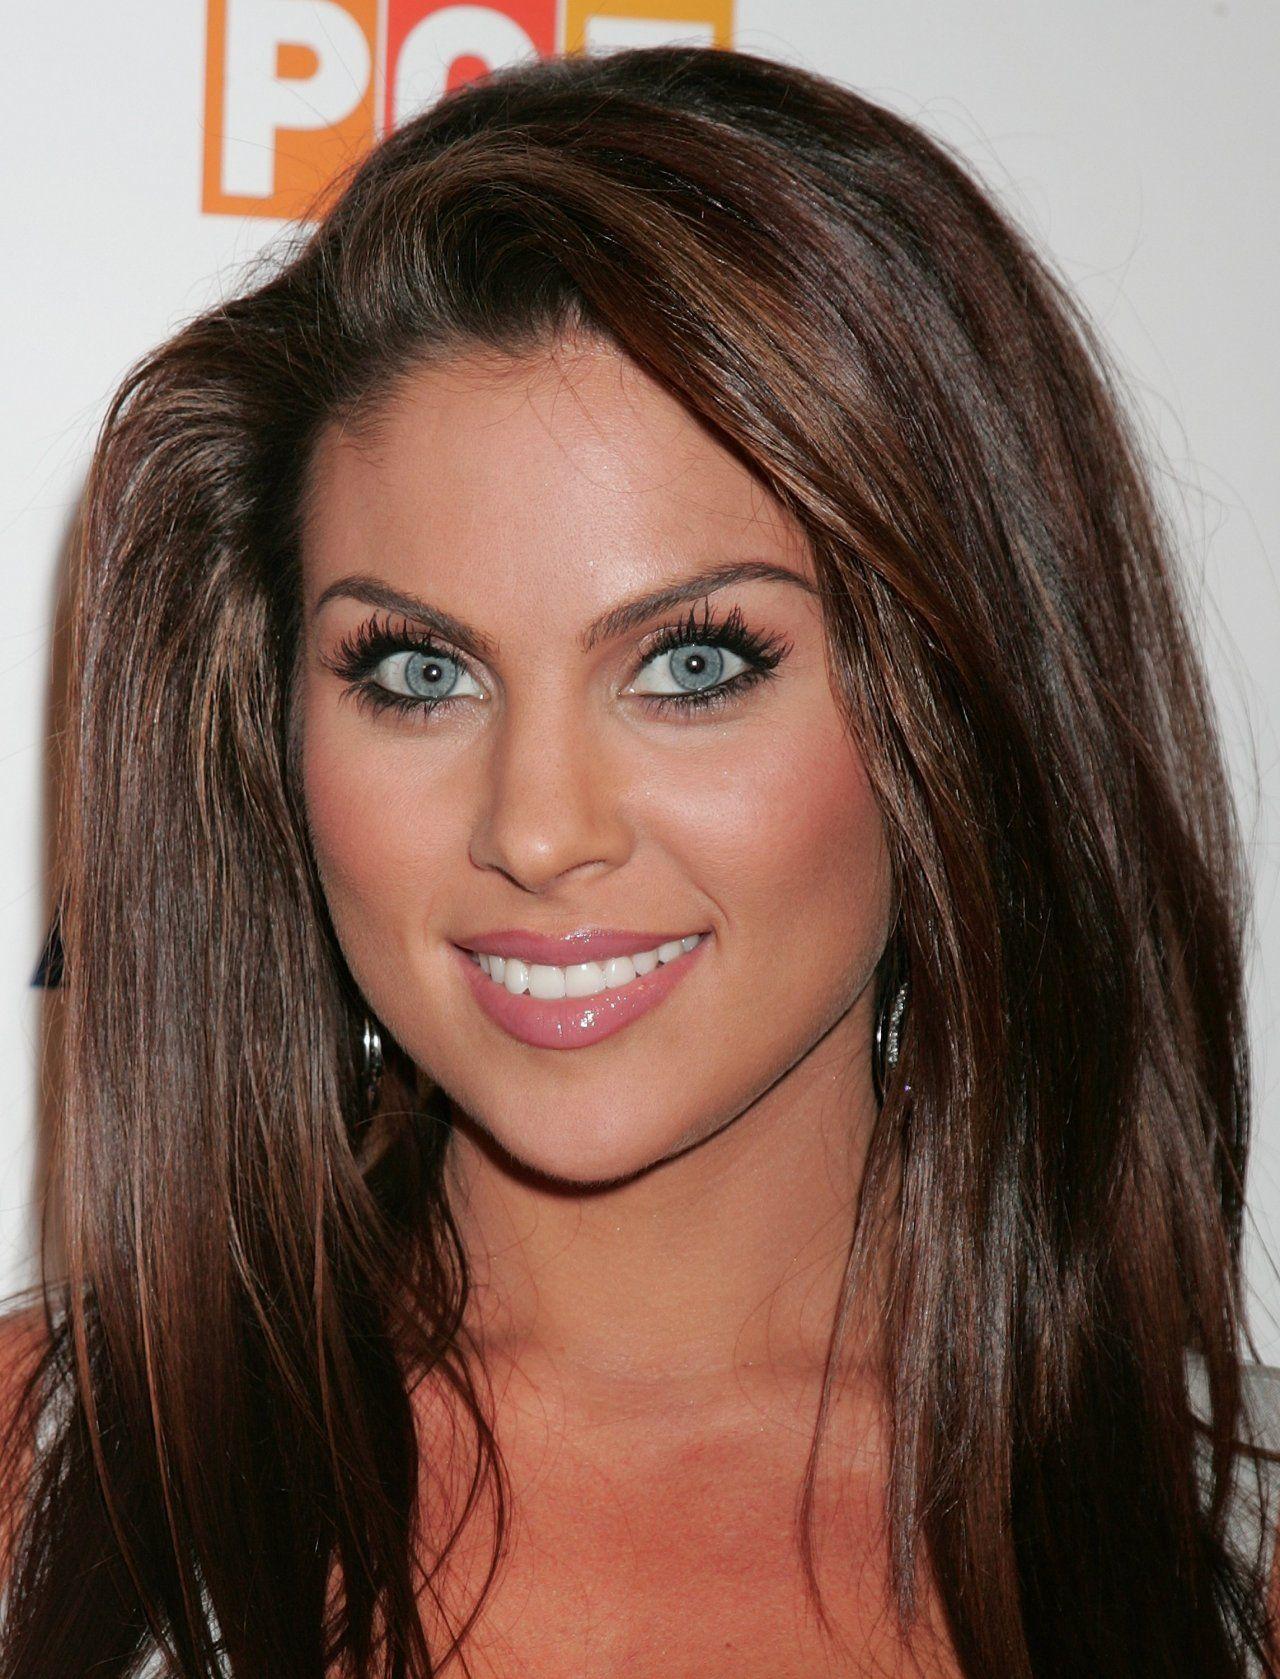 Nadia Bjorlin 1142364 Jpg 1280 1679 Hair Colour For Green Eyes Tan Skin Blonde Hair Pale Skin Hair Color